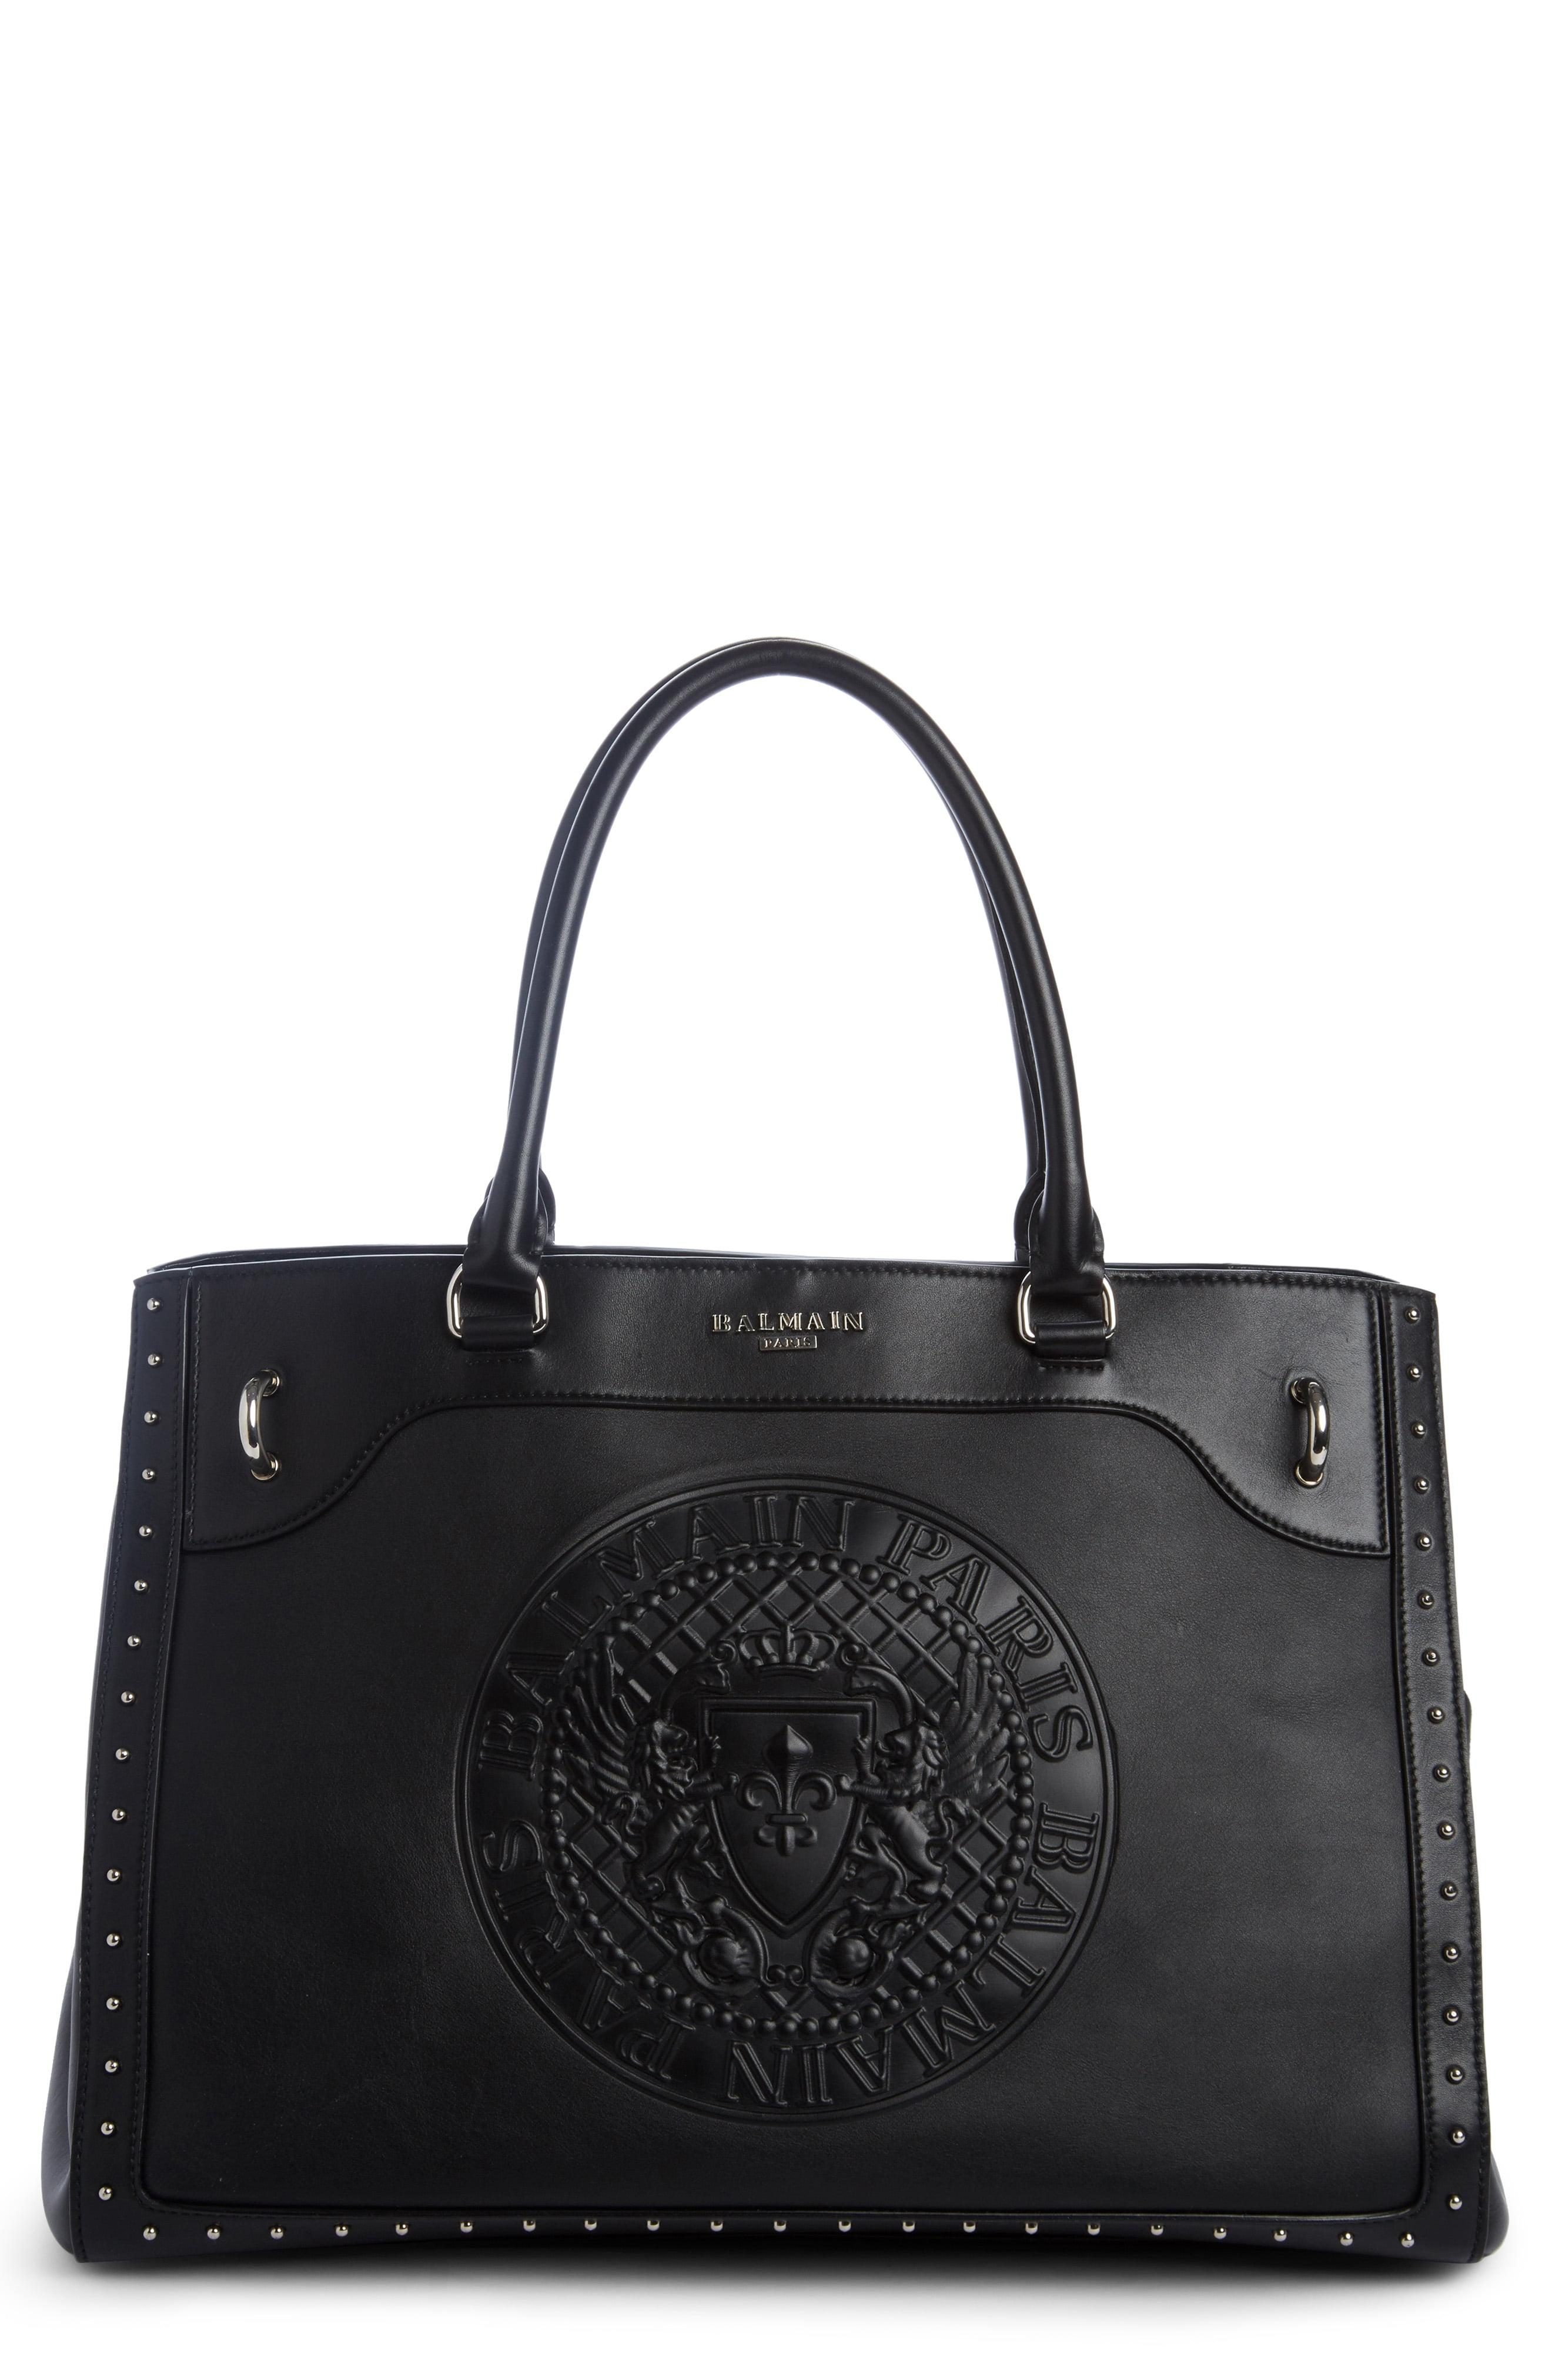 13967cd9 Balmain - Black Renaissance Leather Tote - Lyst. View fullscreen